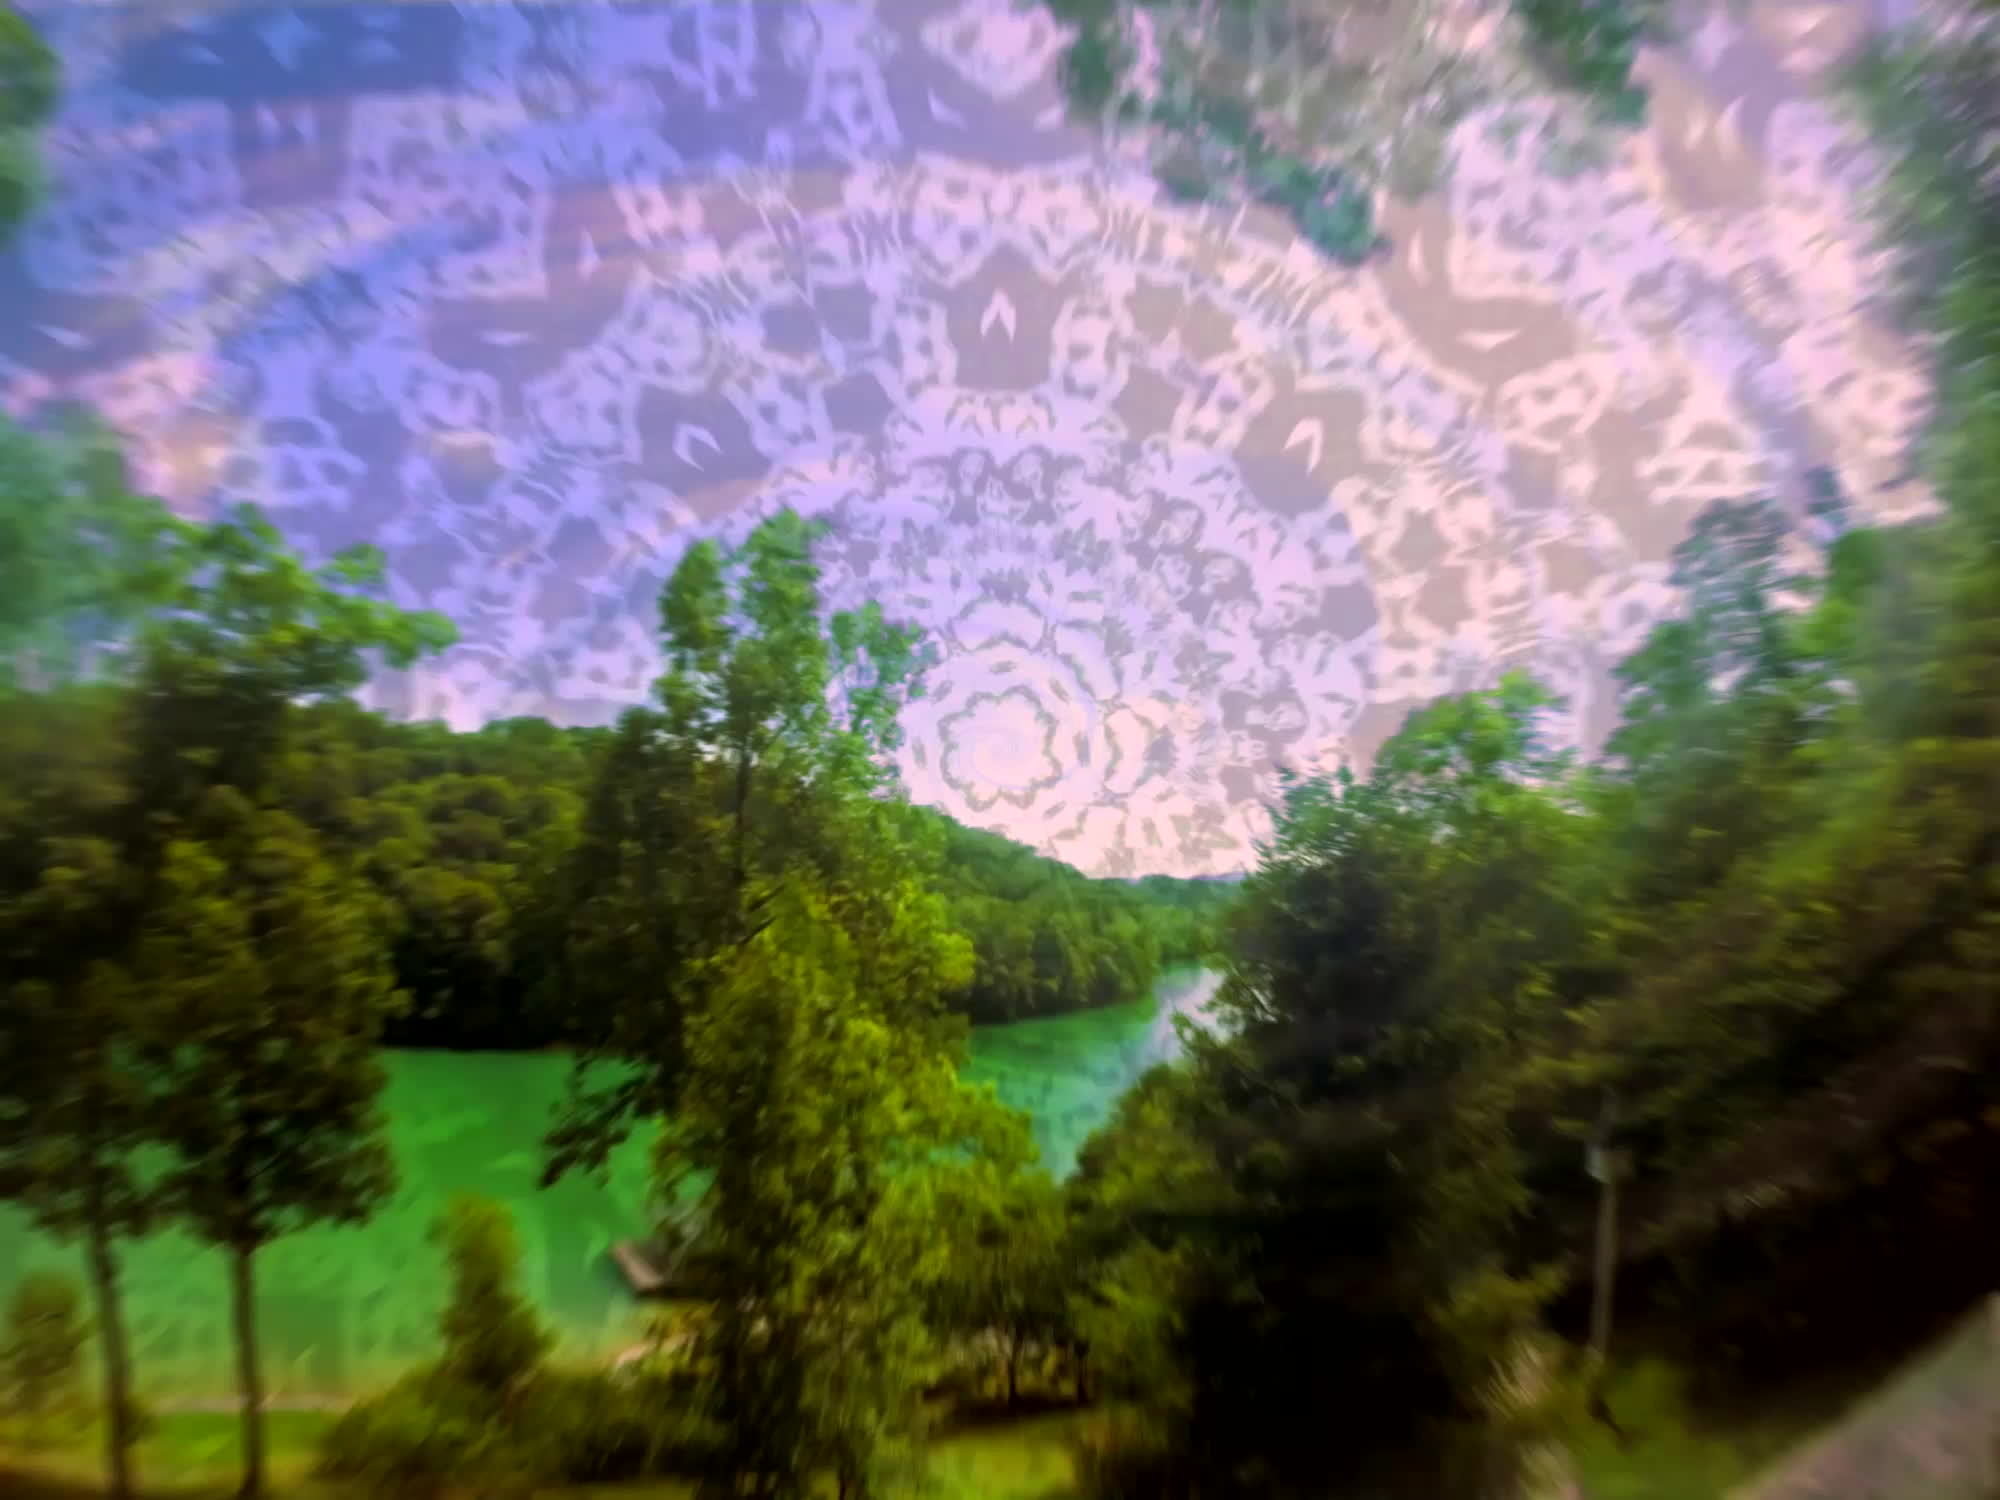 replications, Norris Lake GIFs